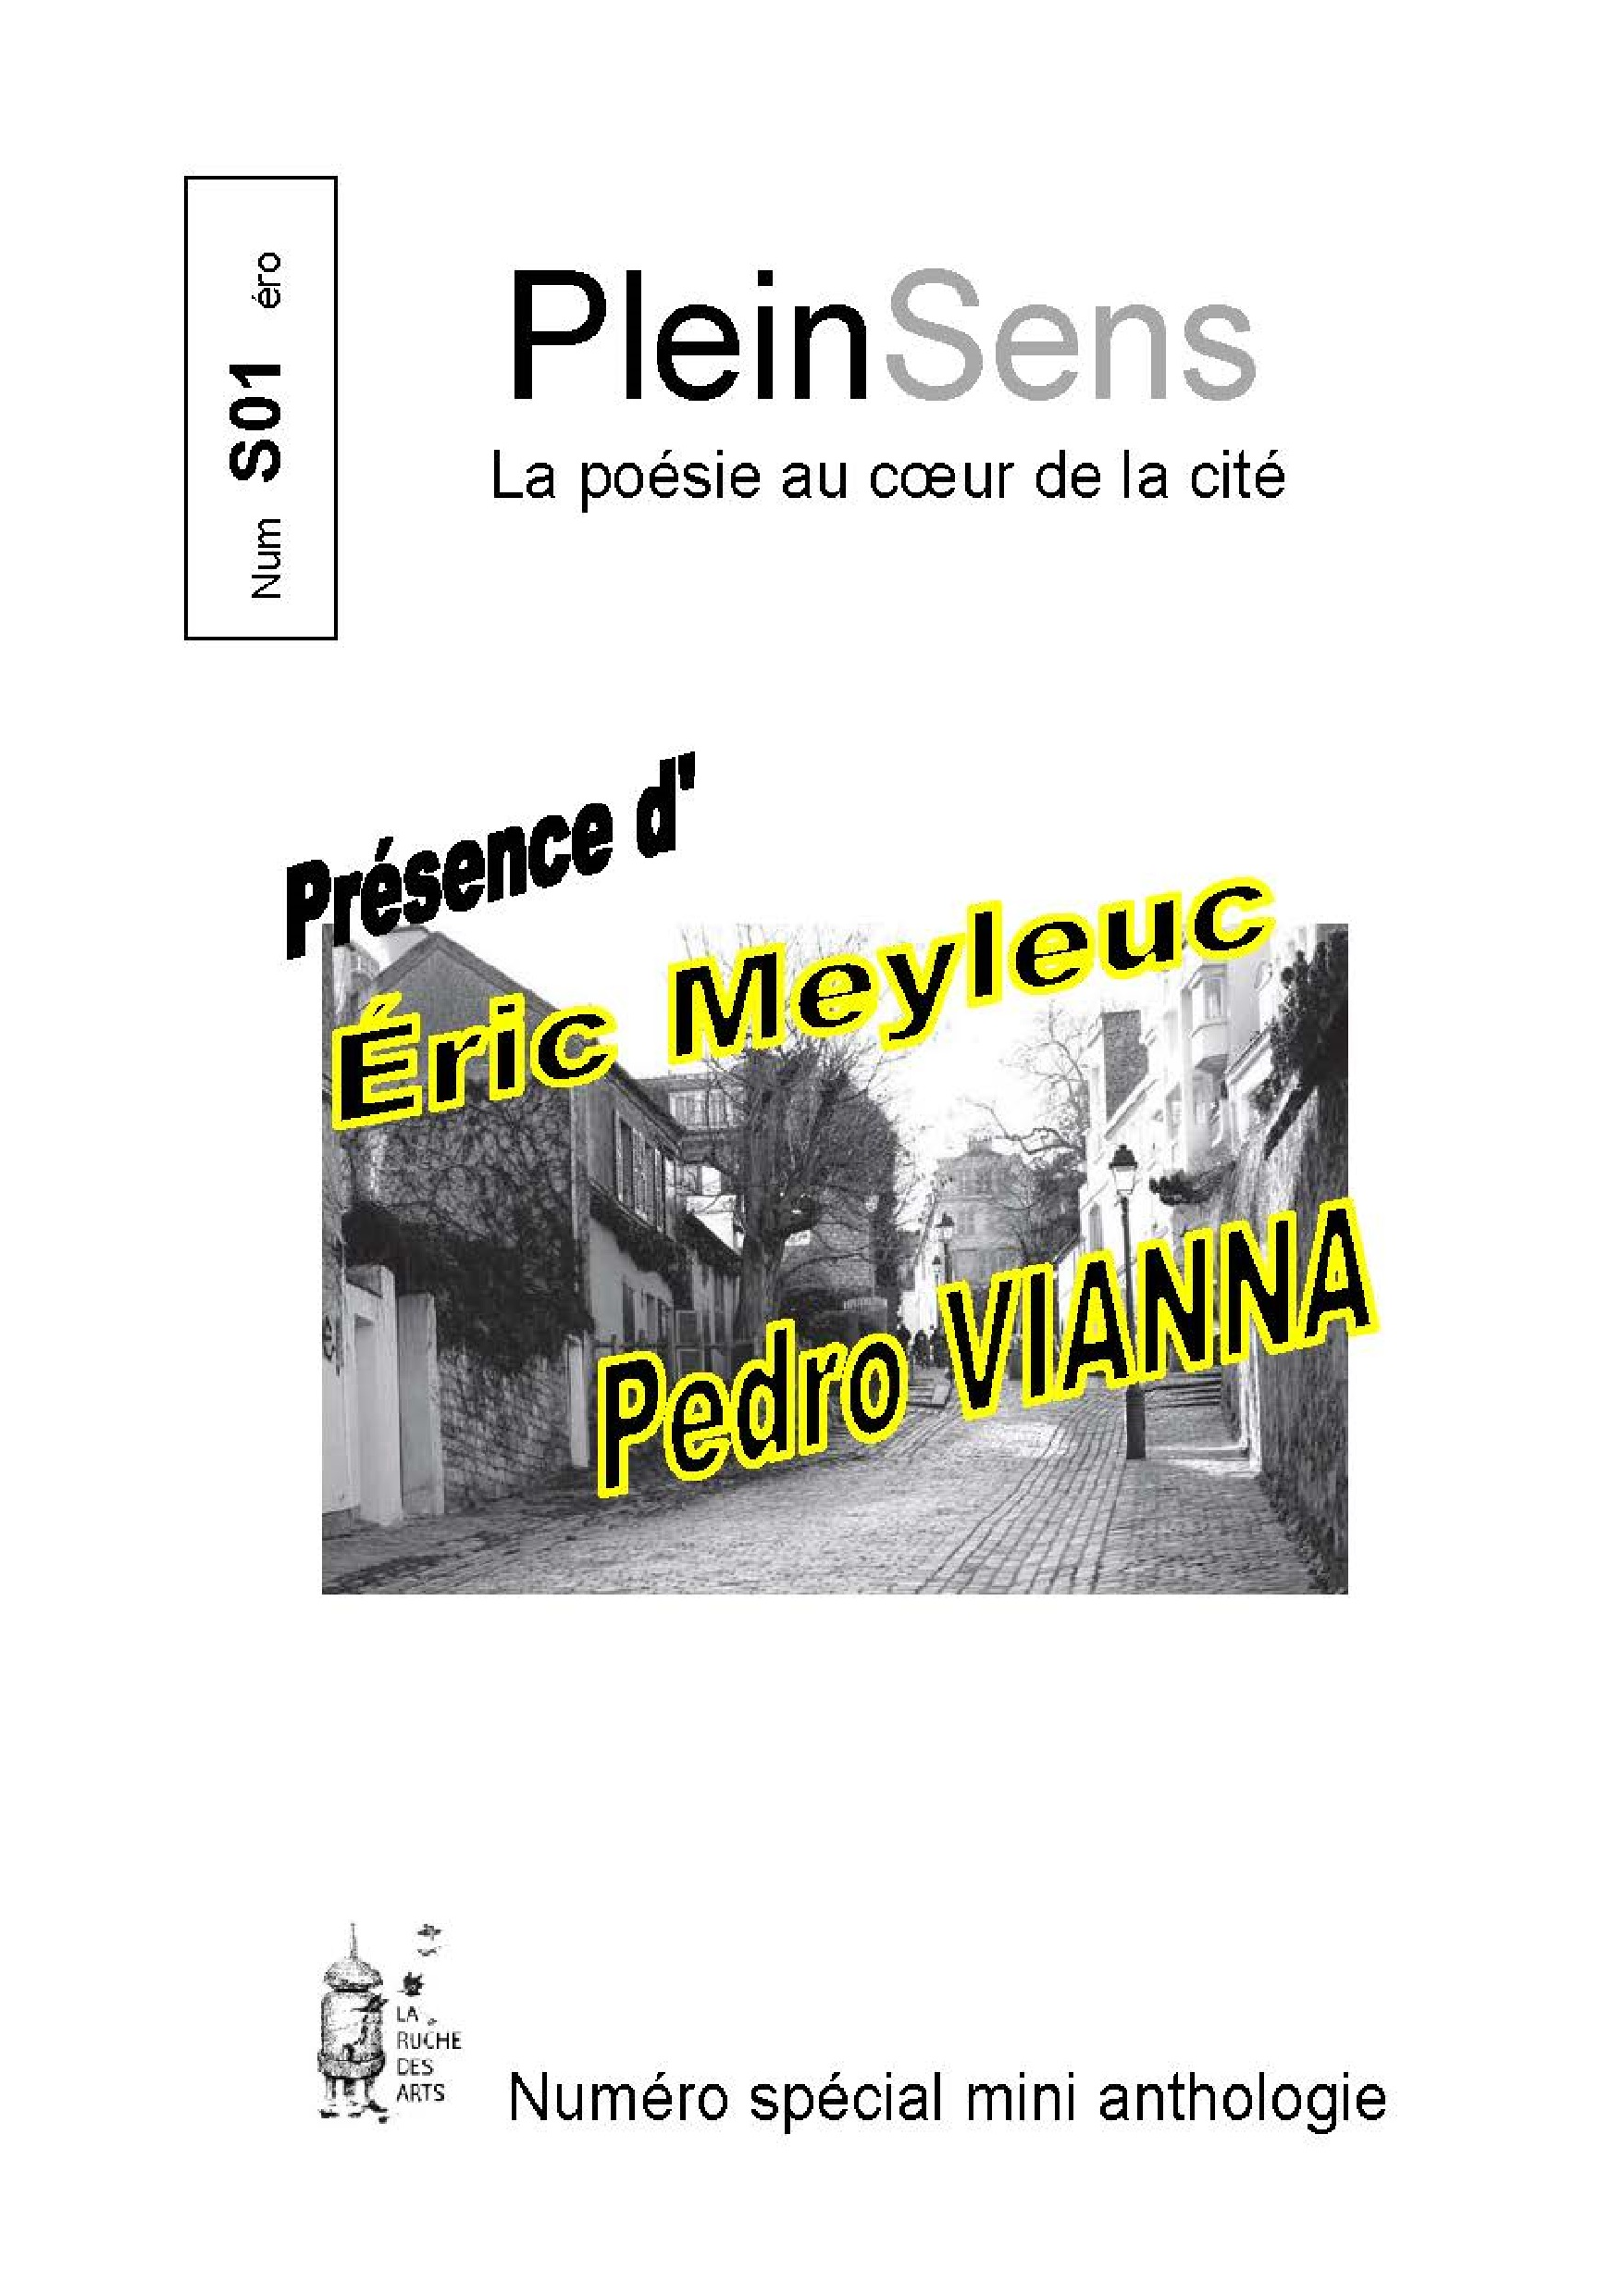 Présence d'Eric Meyleuc Pedro Vianna